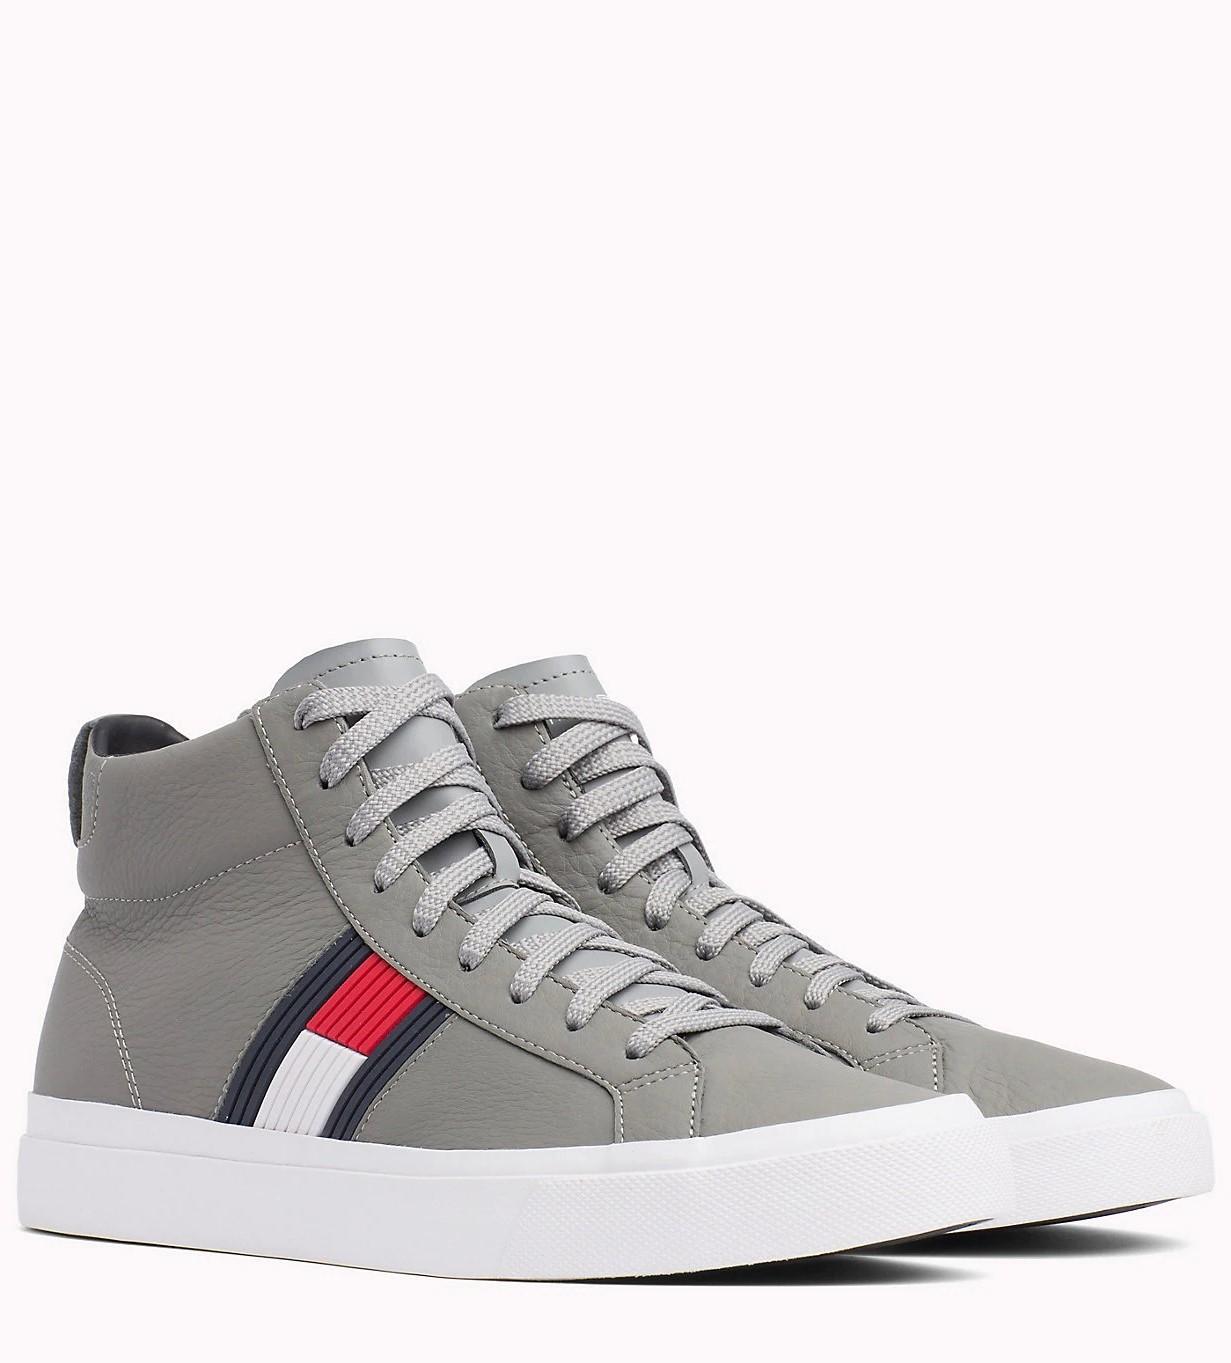 8033b8b13874 -5% -20%. Tommy Hilfiger šedé kožené unisex tenisky Flag Detail High Leather  Sneaker ...